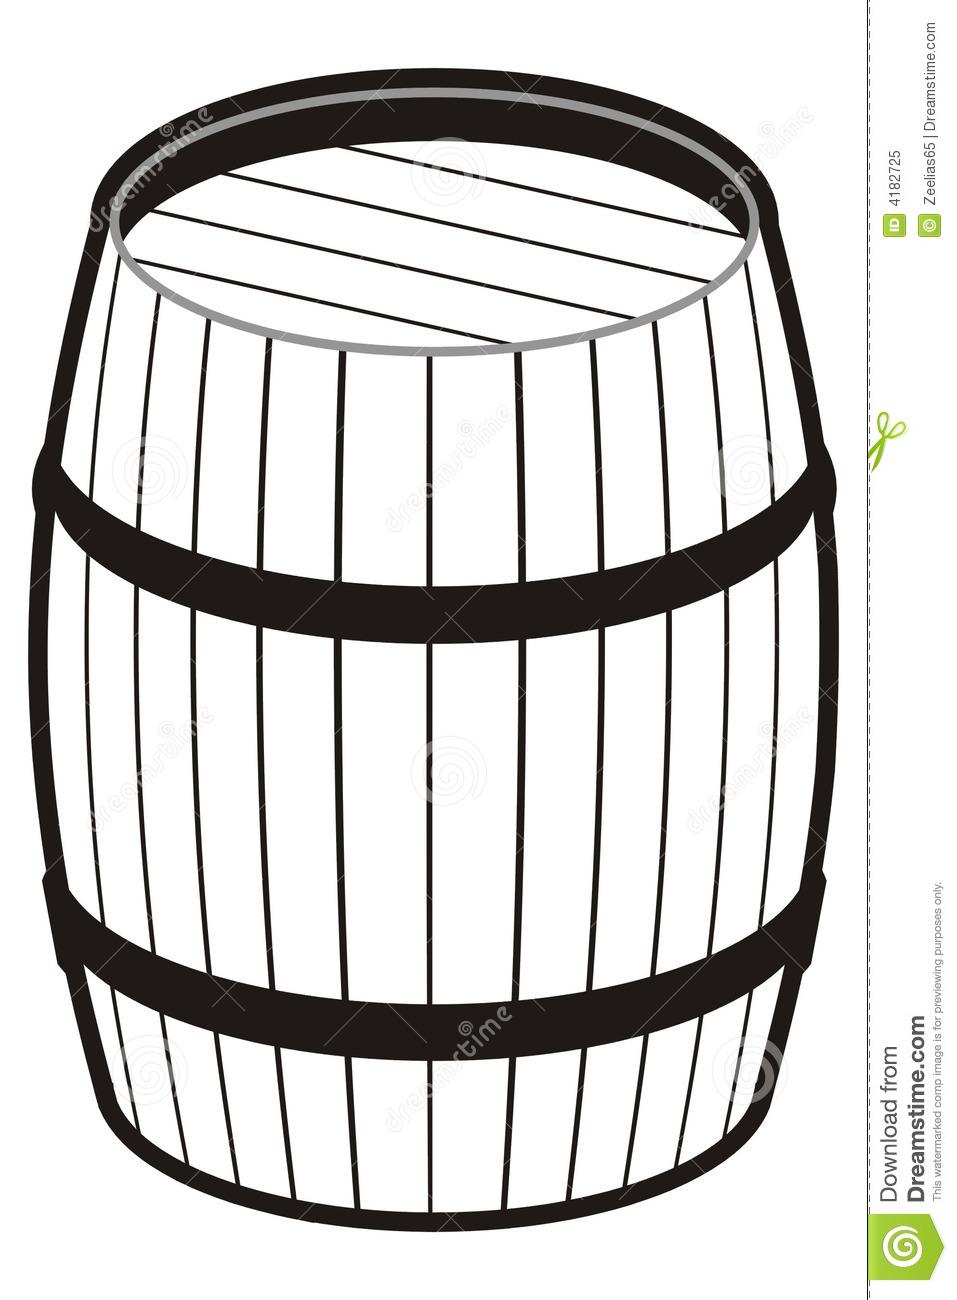 Barrel clipart black and white vector black and white Barrel Clipart | Free download best Barrel Clipart on ClipArtMag.com vector black and white